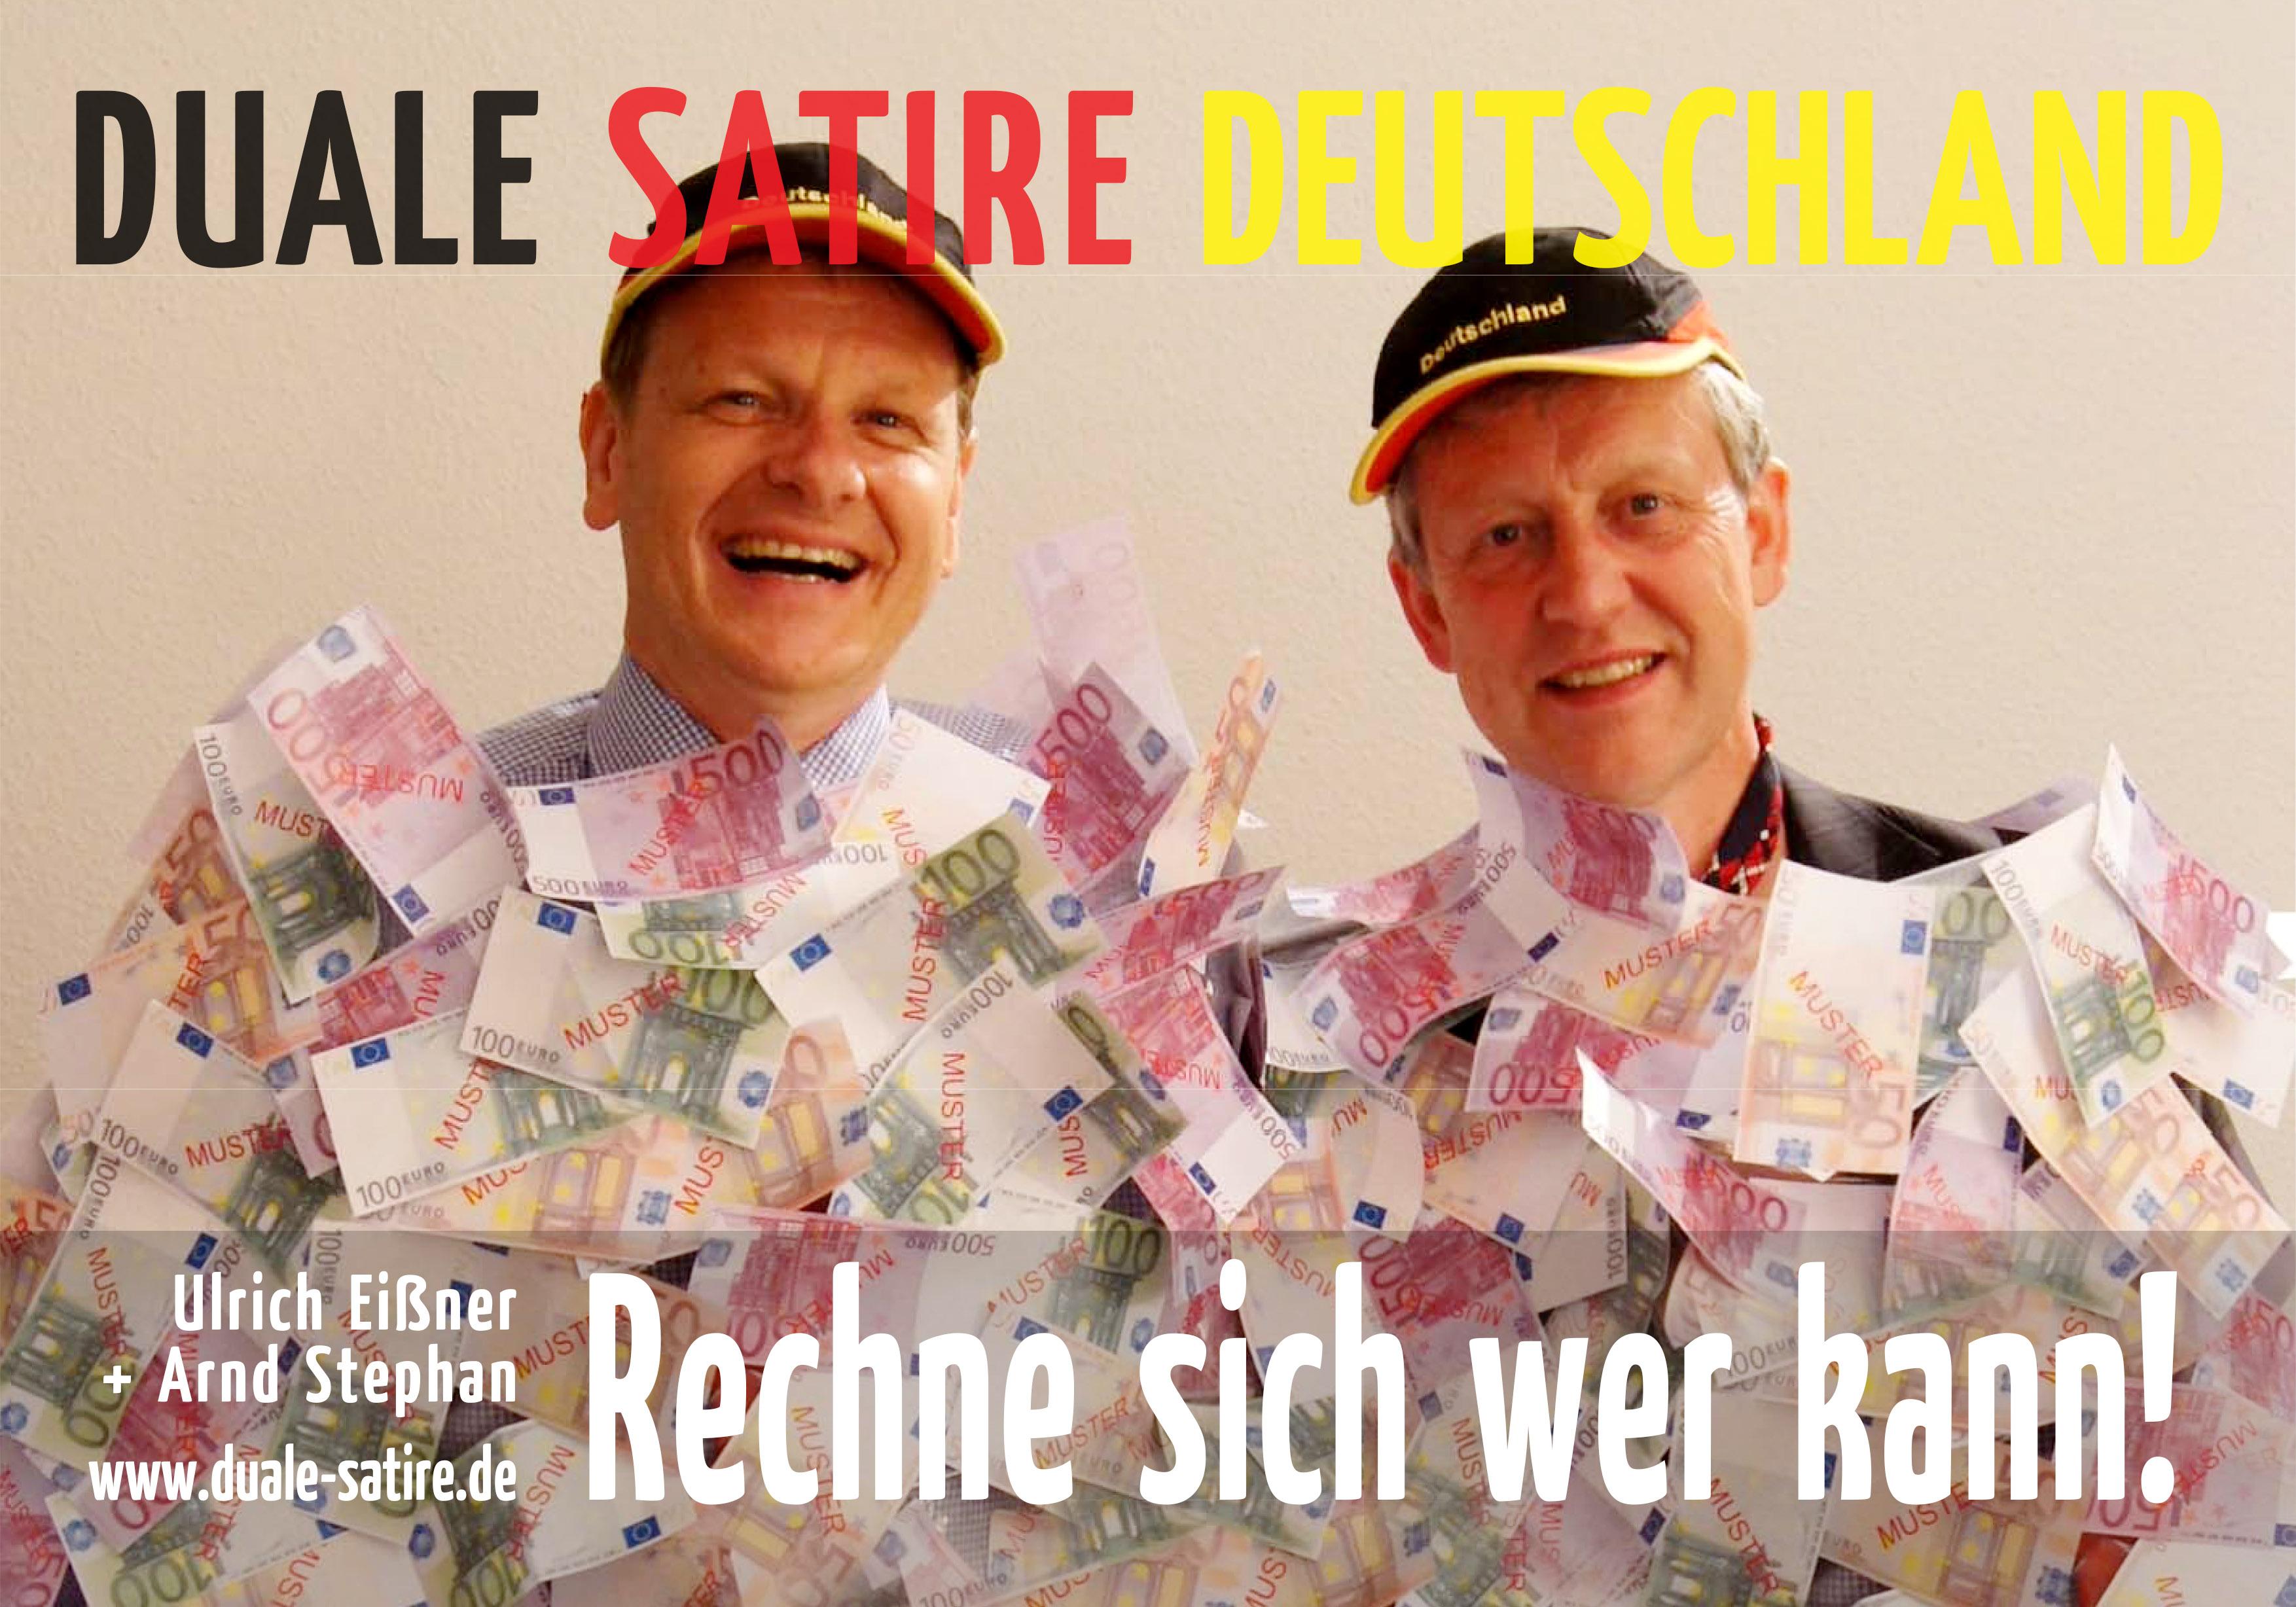 Microsoft Word - Plakat_DSD_Rechne_sich_leer.docx